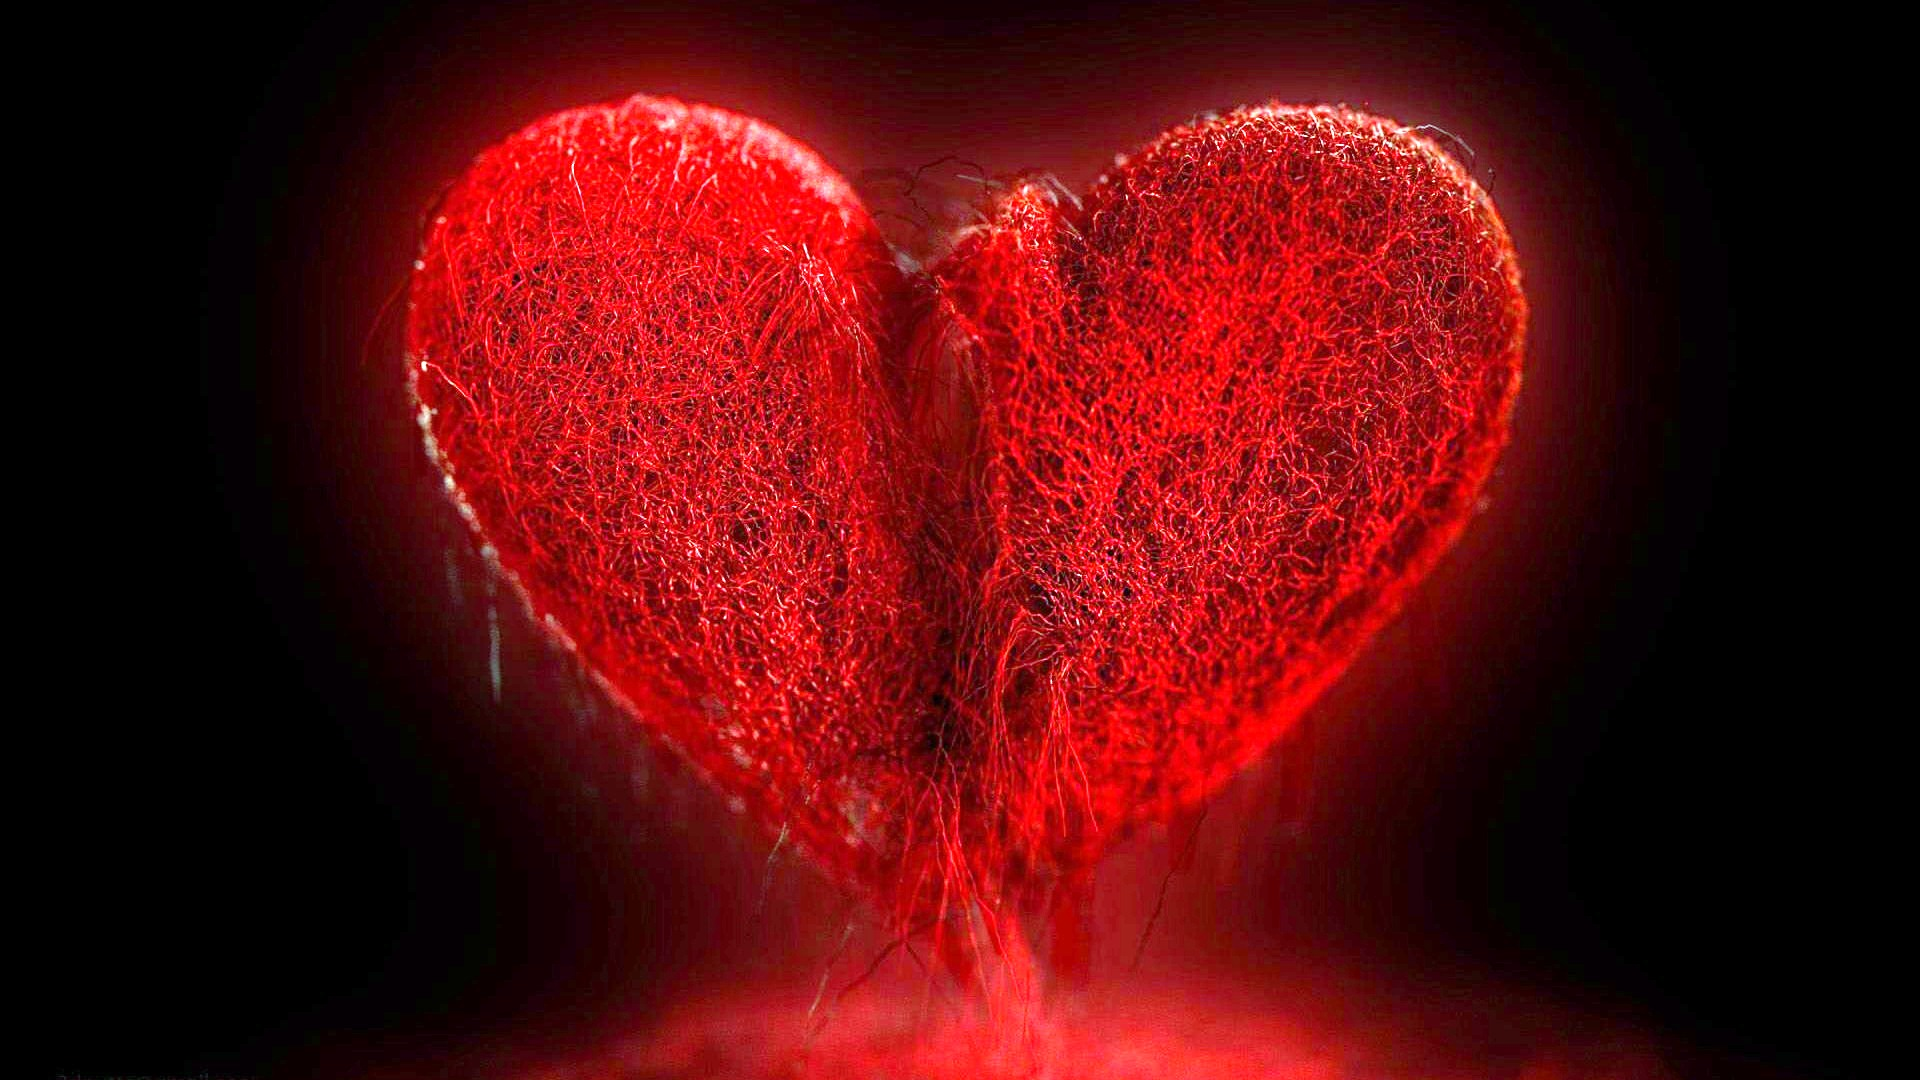 4K Broken Heart Wallpapers High Quality